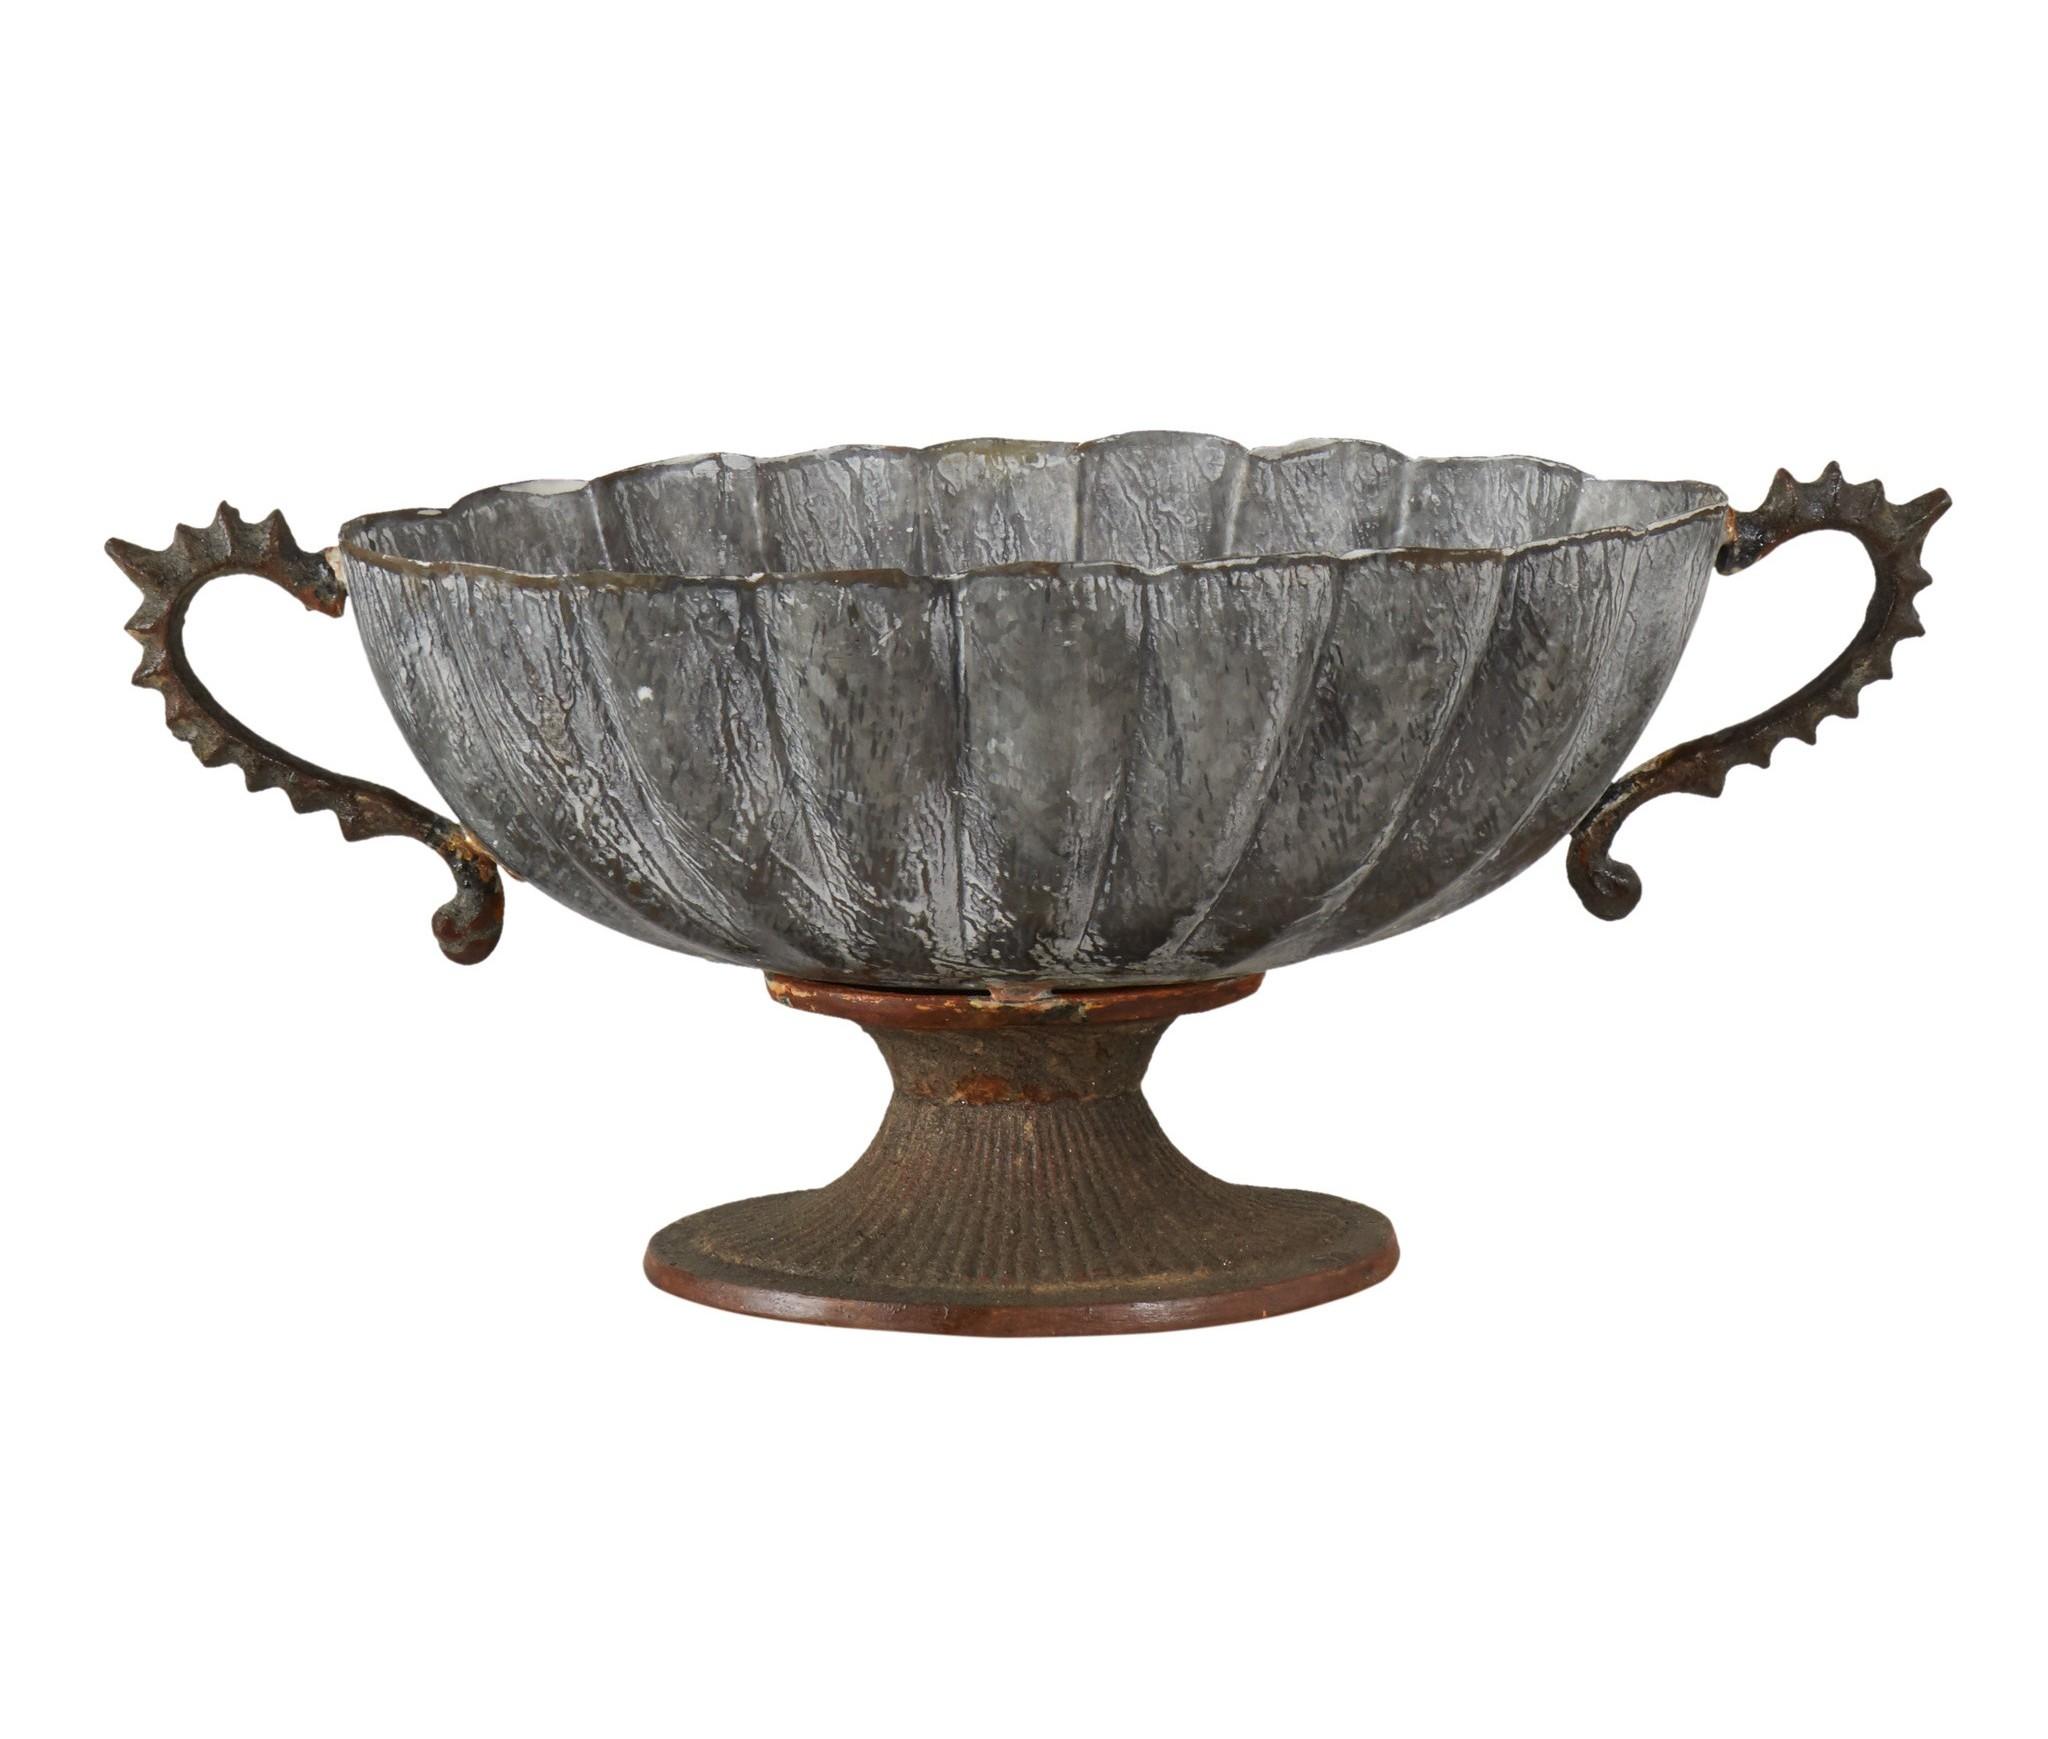 Чаша FenixДекоративные чаши<br><br><br>Material: Металл<br>Ширина см: 39<br>Высота см: 17<br>Глубина см: 20